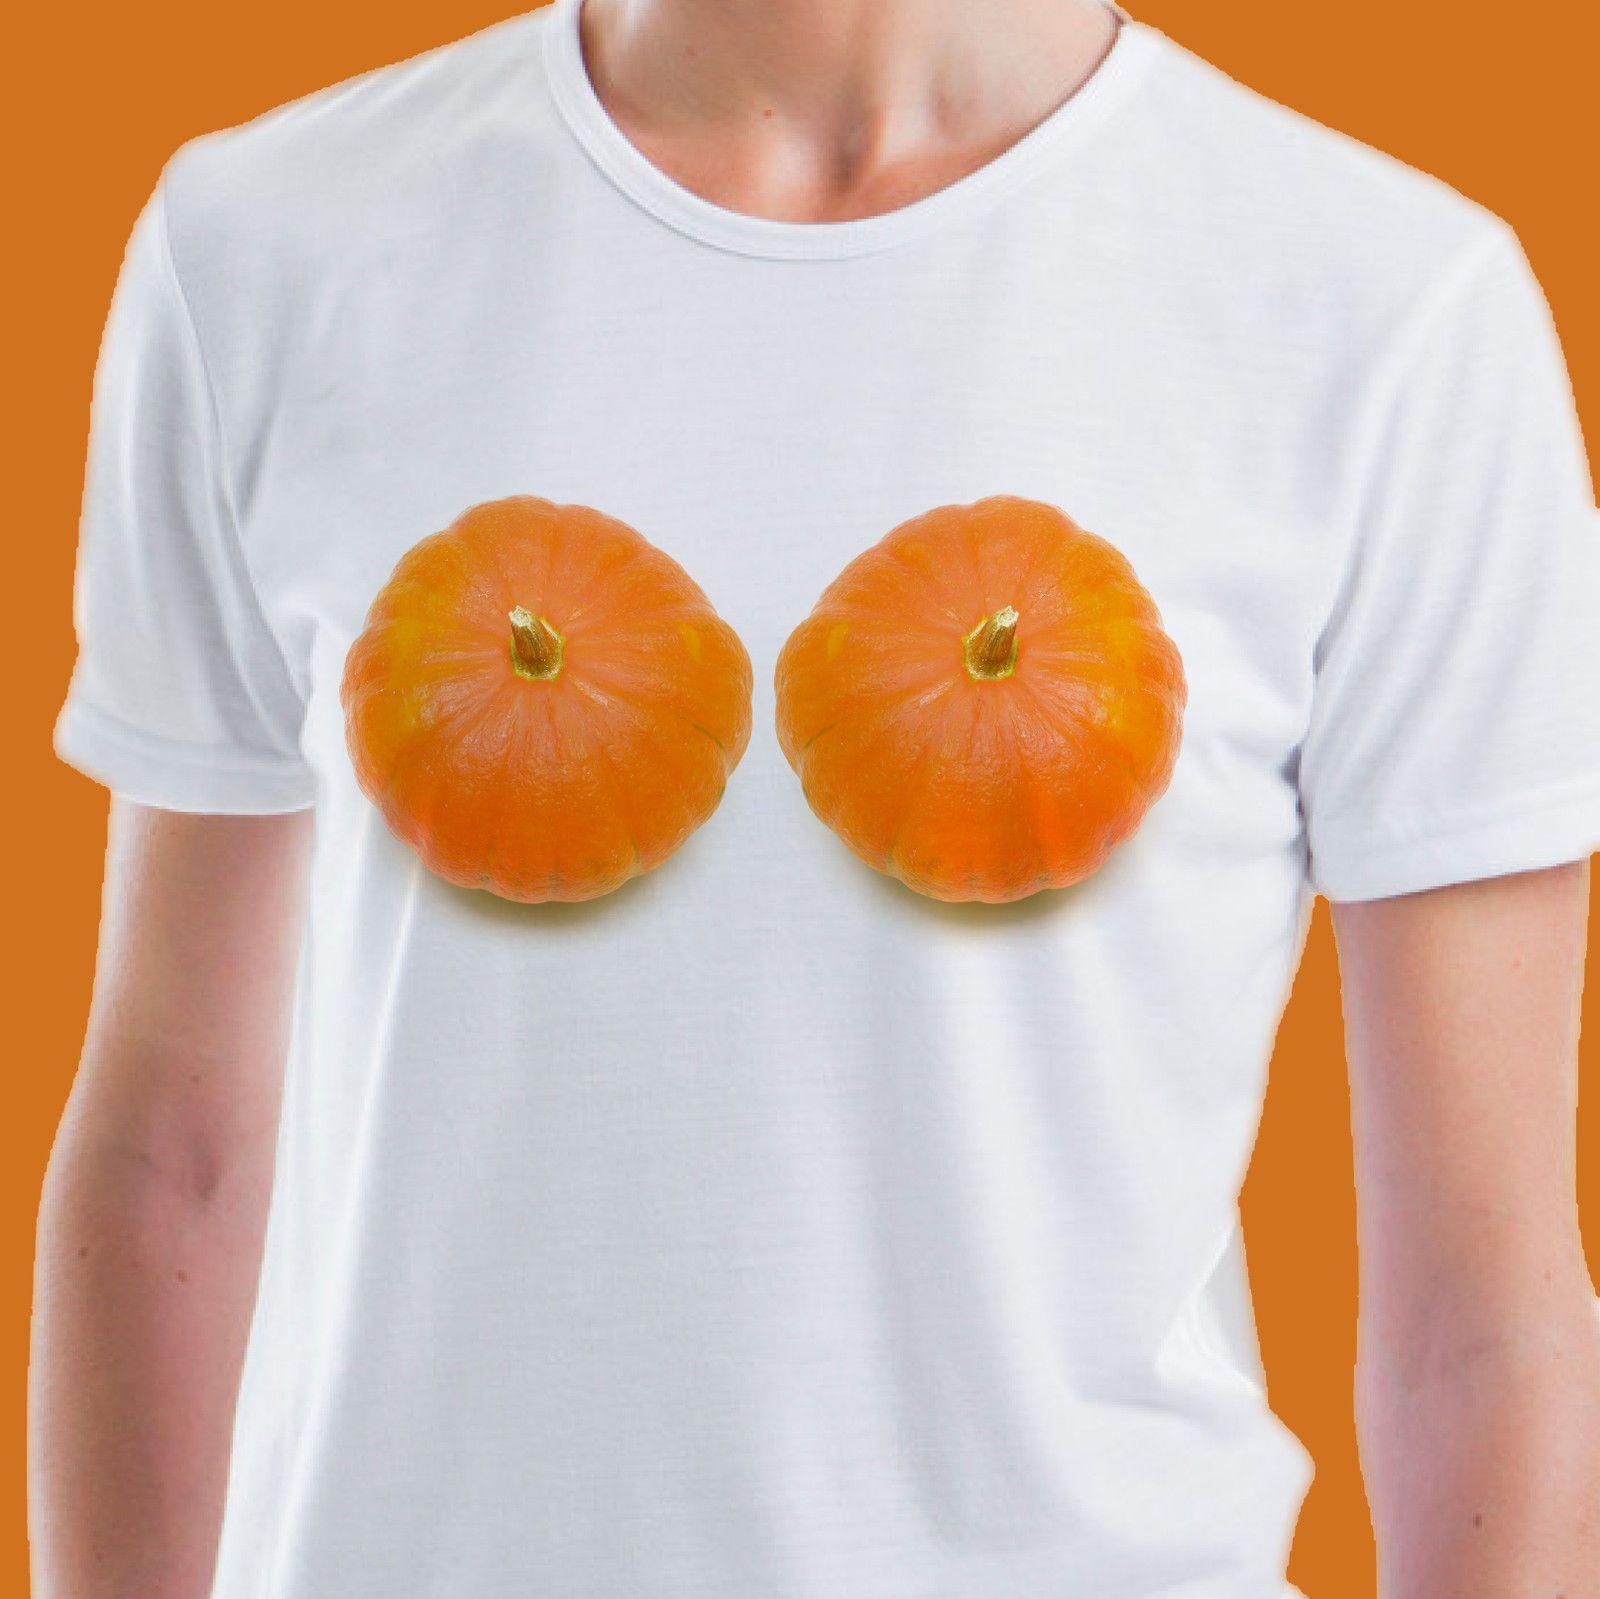 6335452e1 Halloween Pumpkin Boobs T Shirt Mens Ladies Gift Rude Joke Funny Costume  Funny Unisex Casual Shirts For Men Shirt Design From Pickapair, $12.96|  DHgate.Com